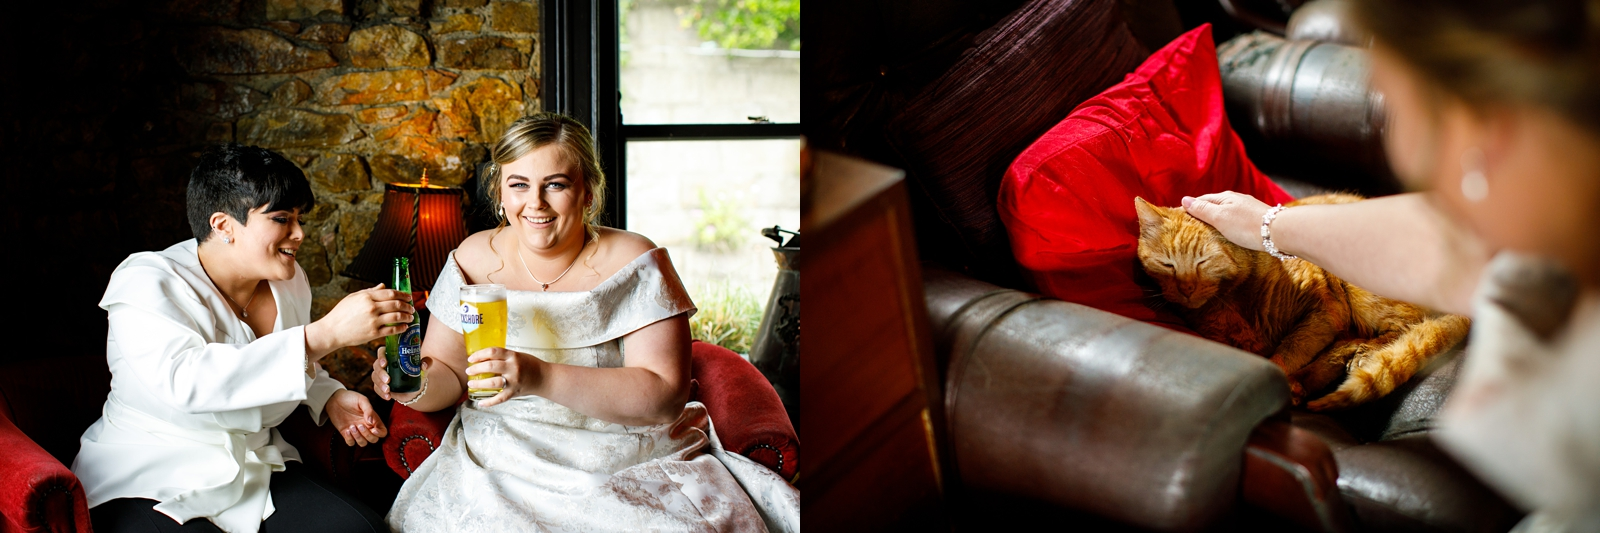 Dublin Weddings Elisha Clarke Photography_0015.jpg